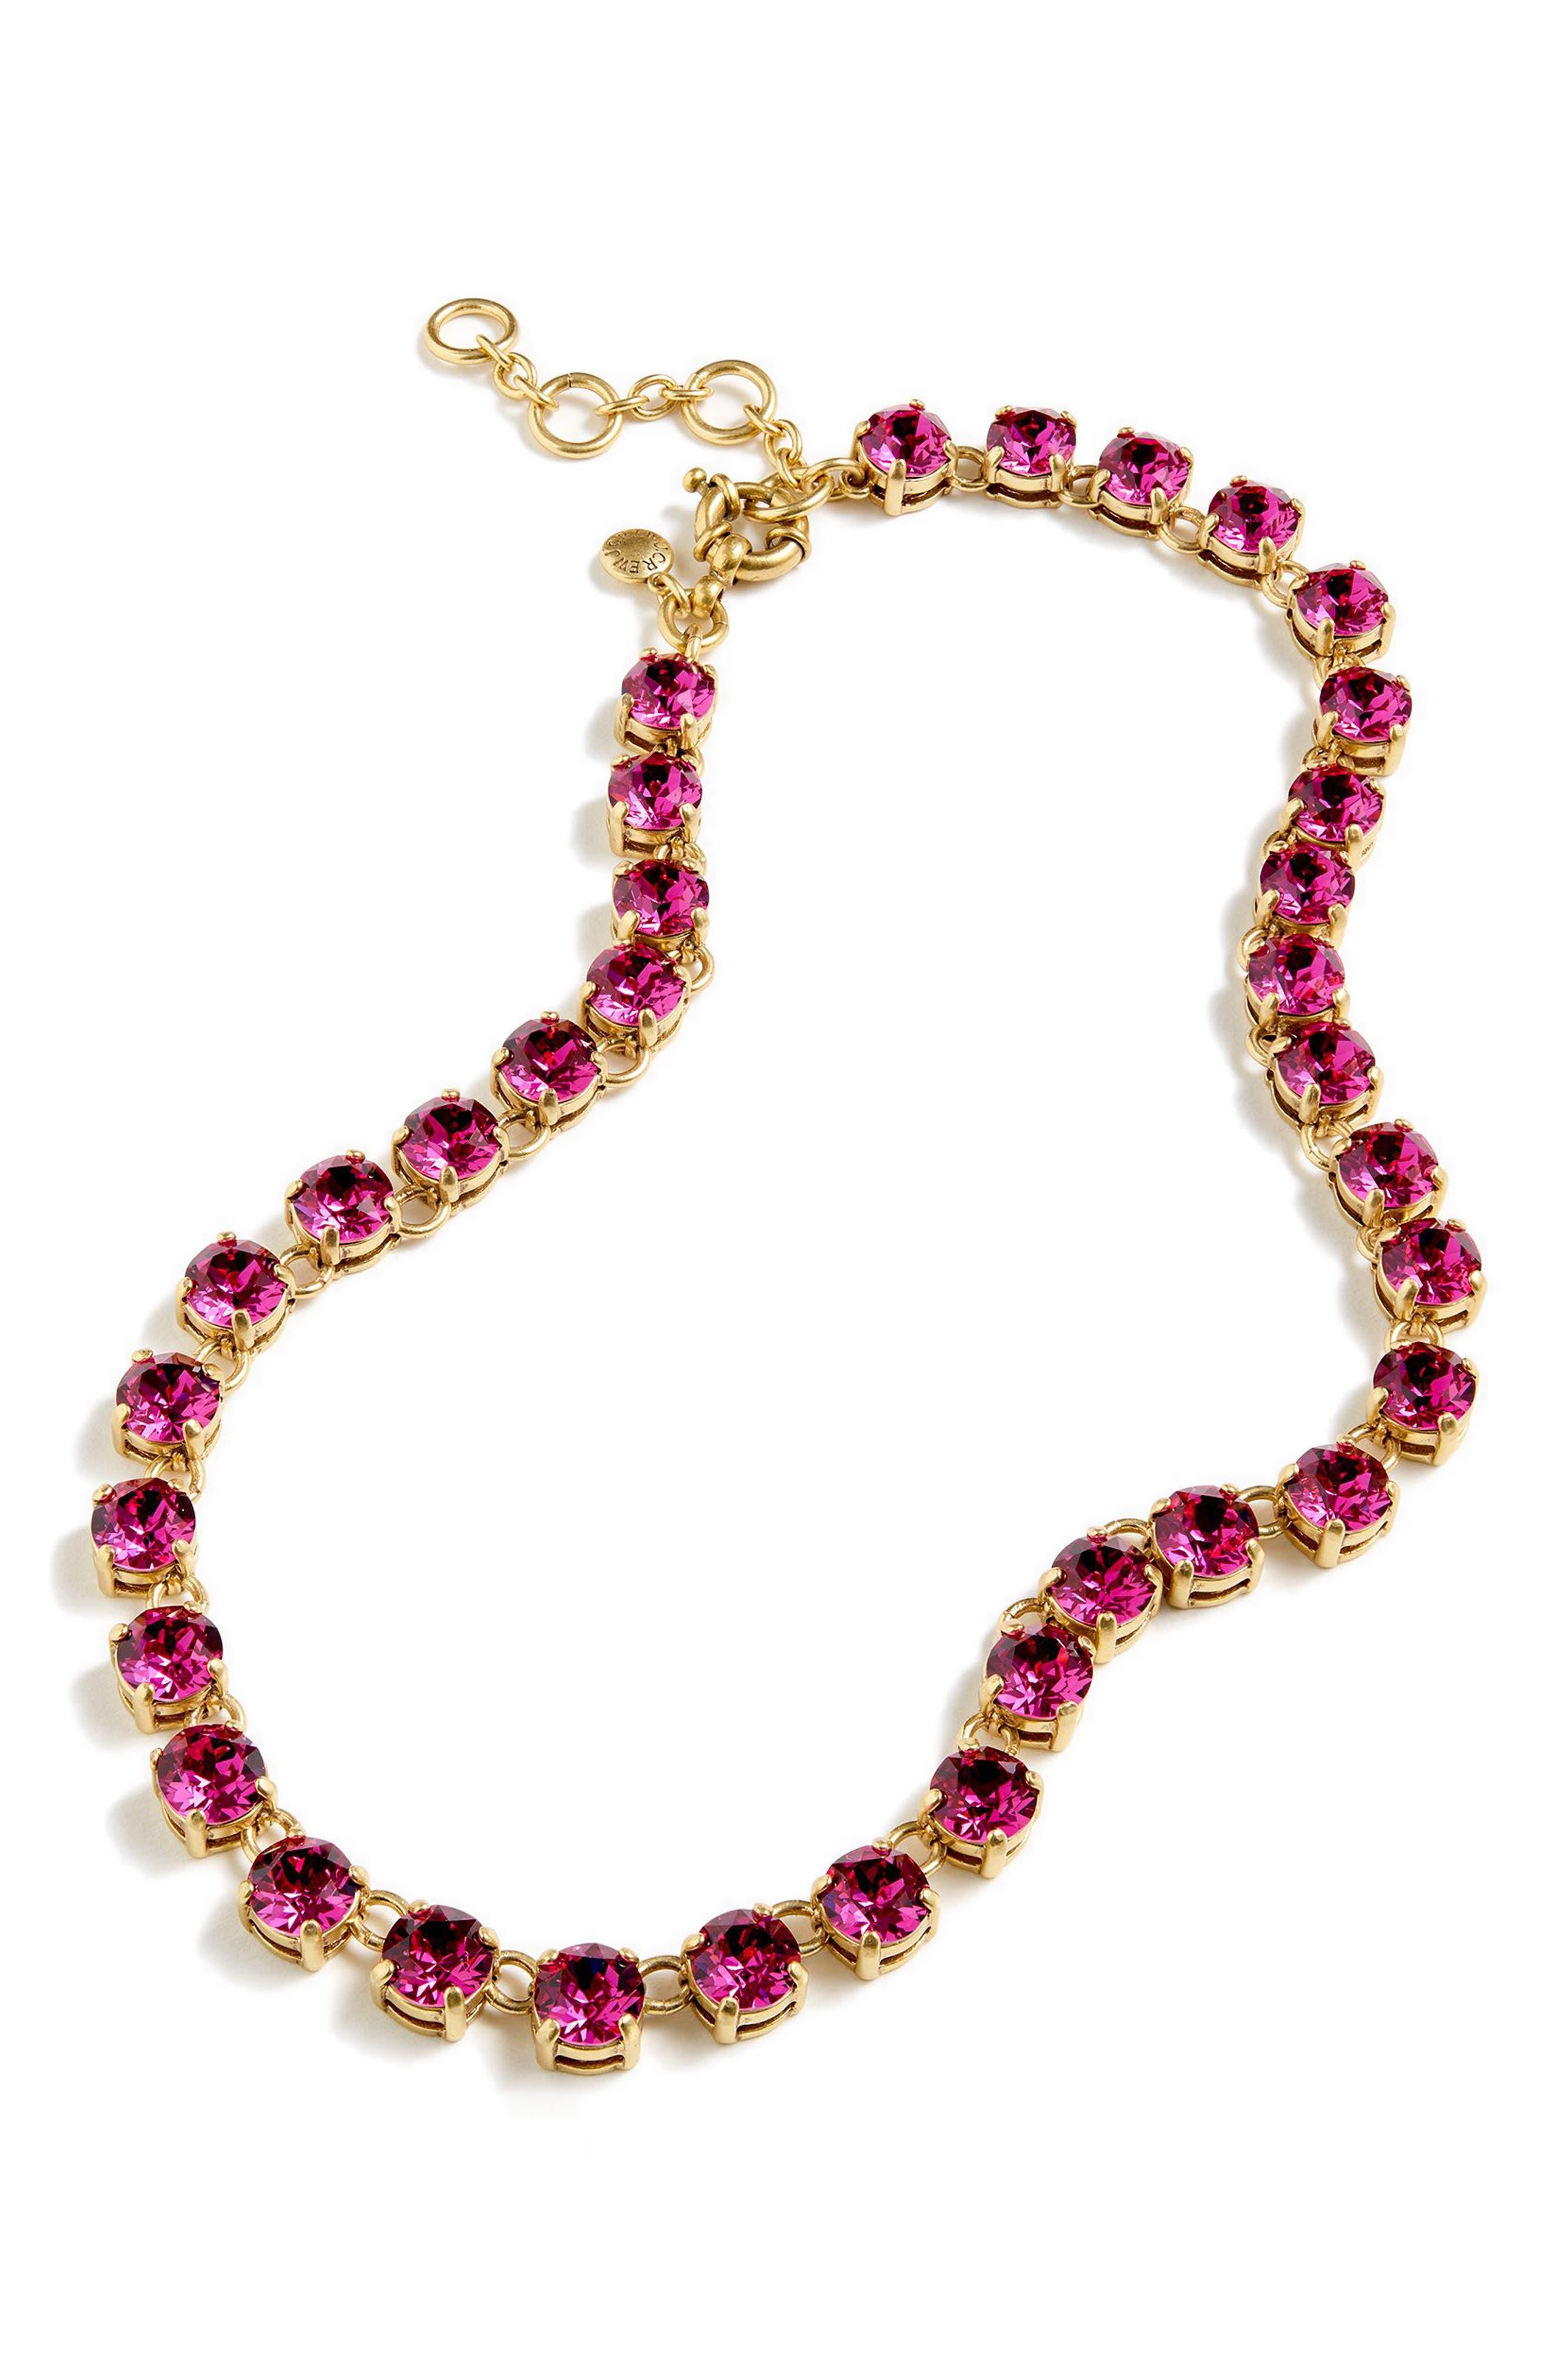 J.CREW Swarovski Crystal Dot Necklace in Warm Blush